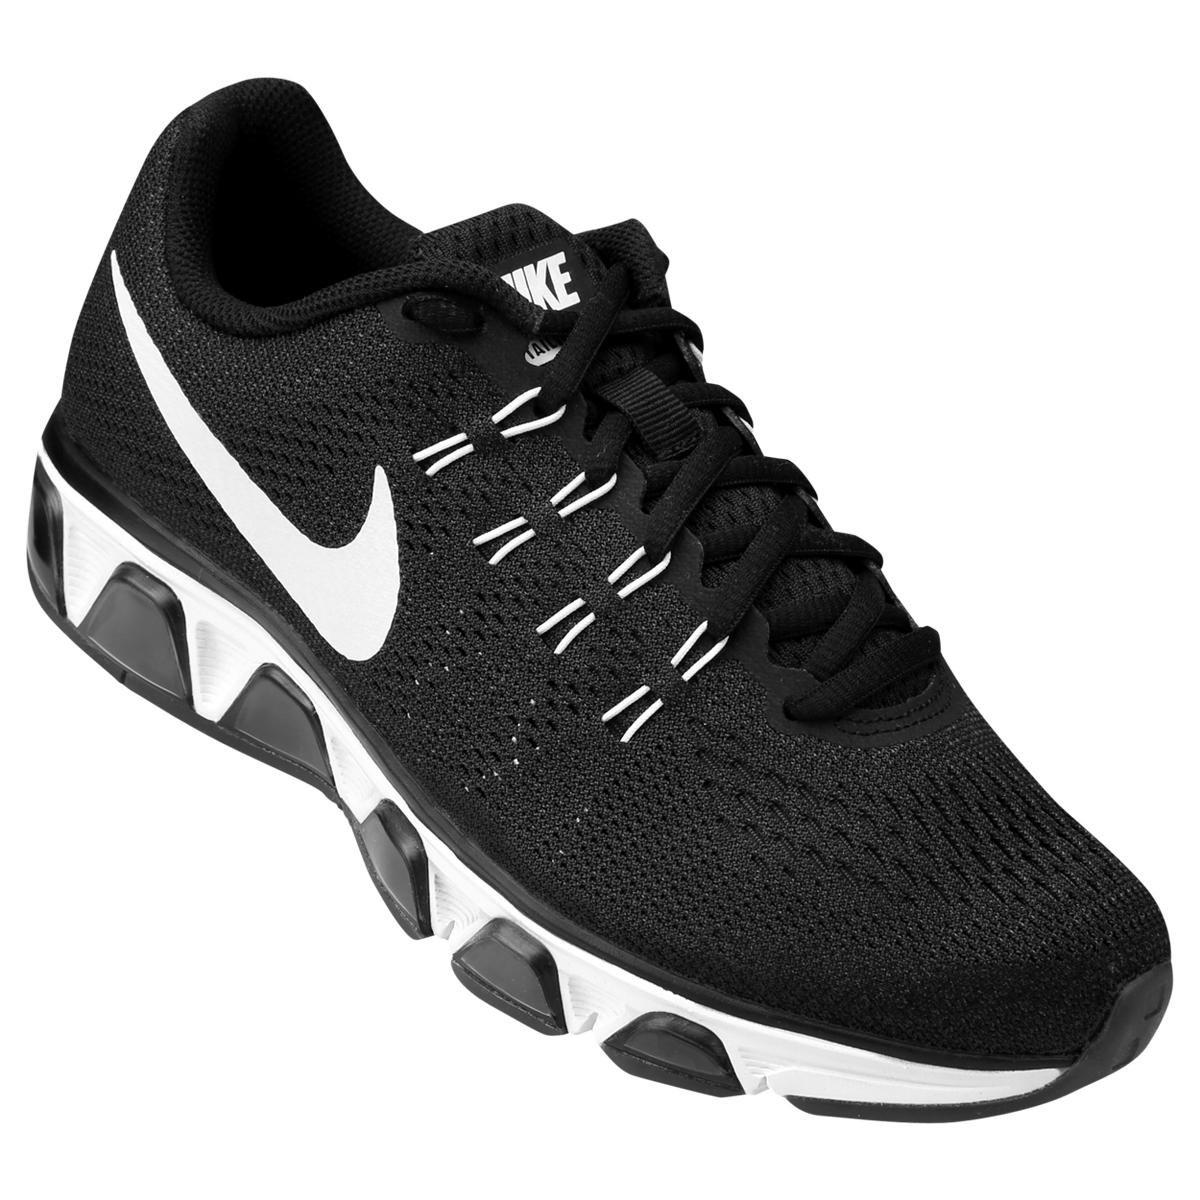 46226e1a297 Tênis Nike Air Max Tailwind 8 Feminino - Compre Agora